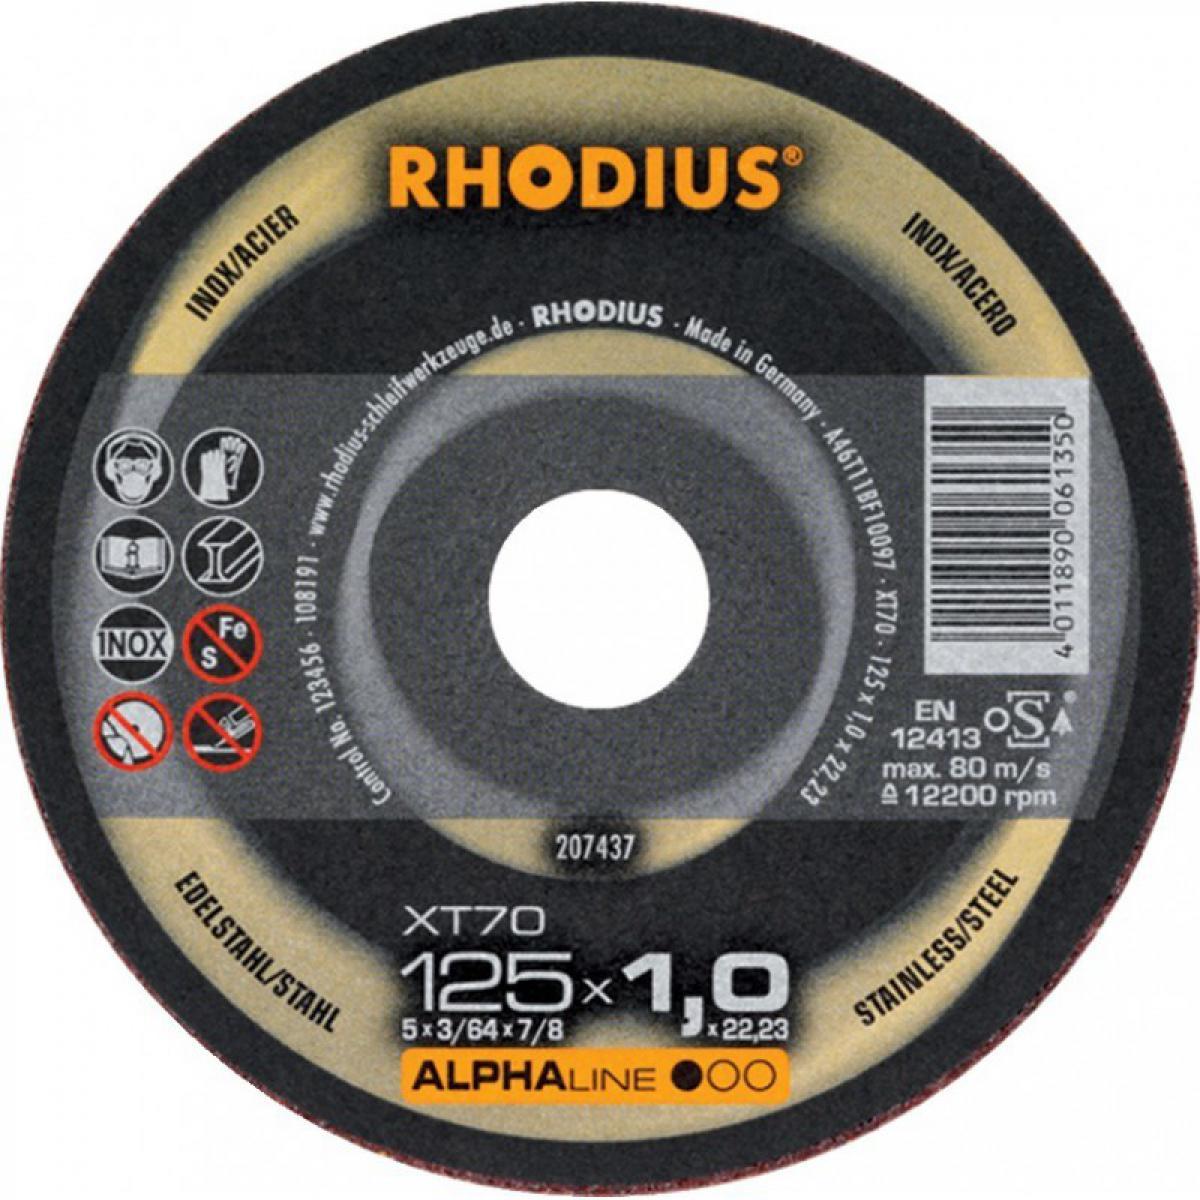 Rhodius Disque à tronconner acier / inox XT70 125 x 1,0mm ger. Rhodius